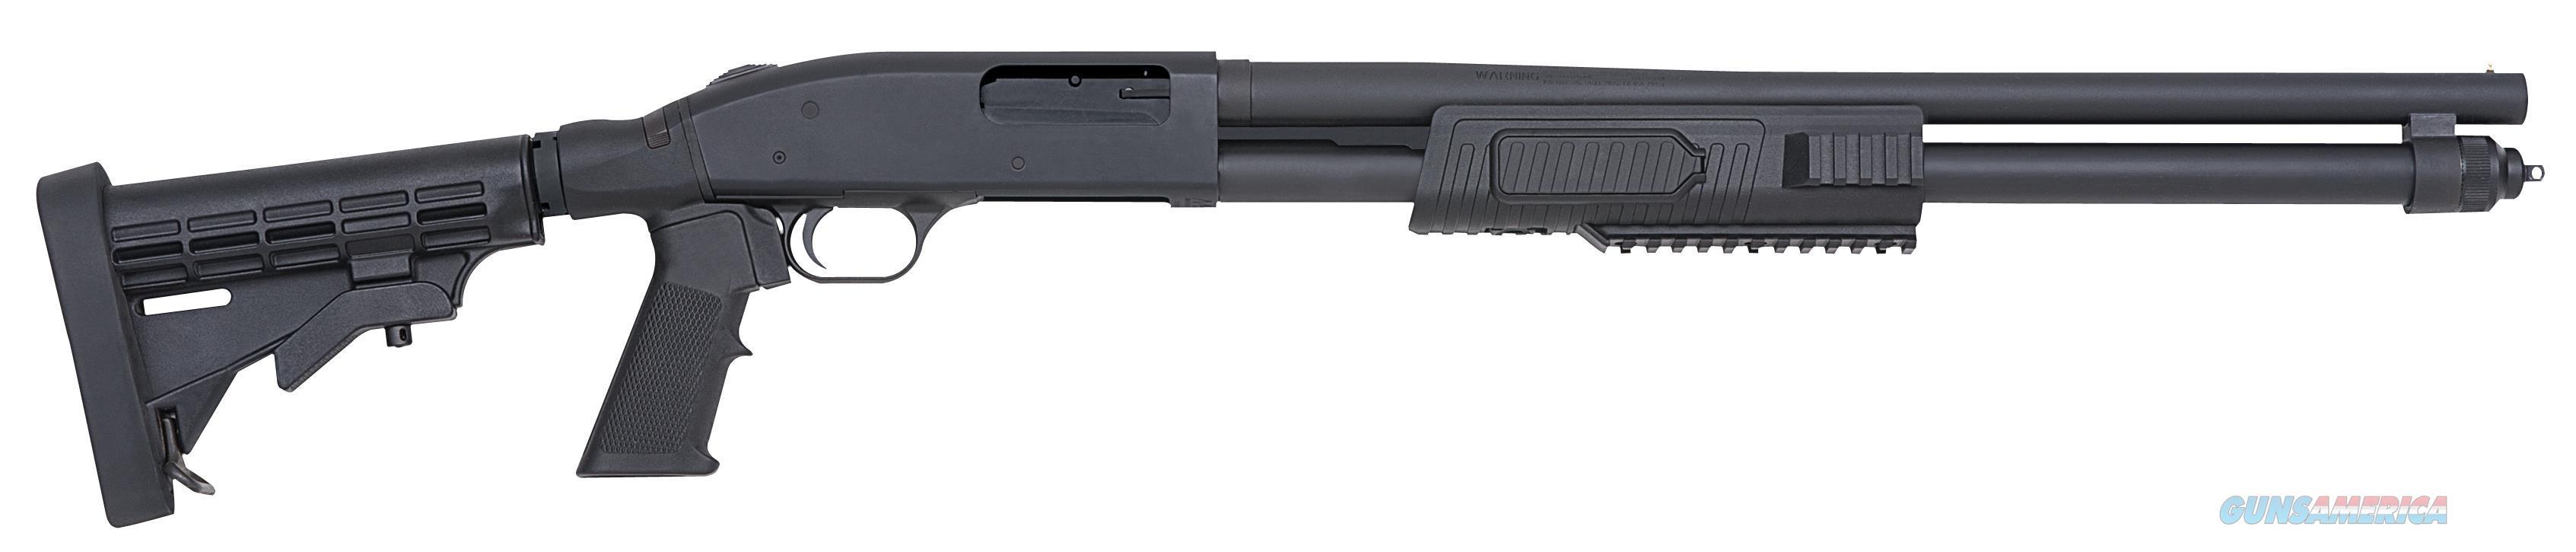 "Mossberg Flex 590Tctl 12G 20"" 6Pos 51672  Guns > Shotguns > MN Misc Shotguns"